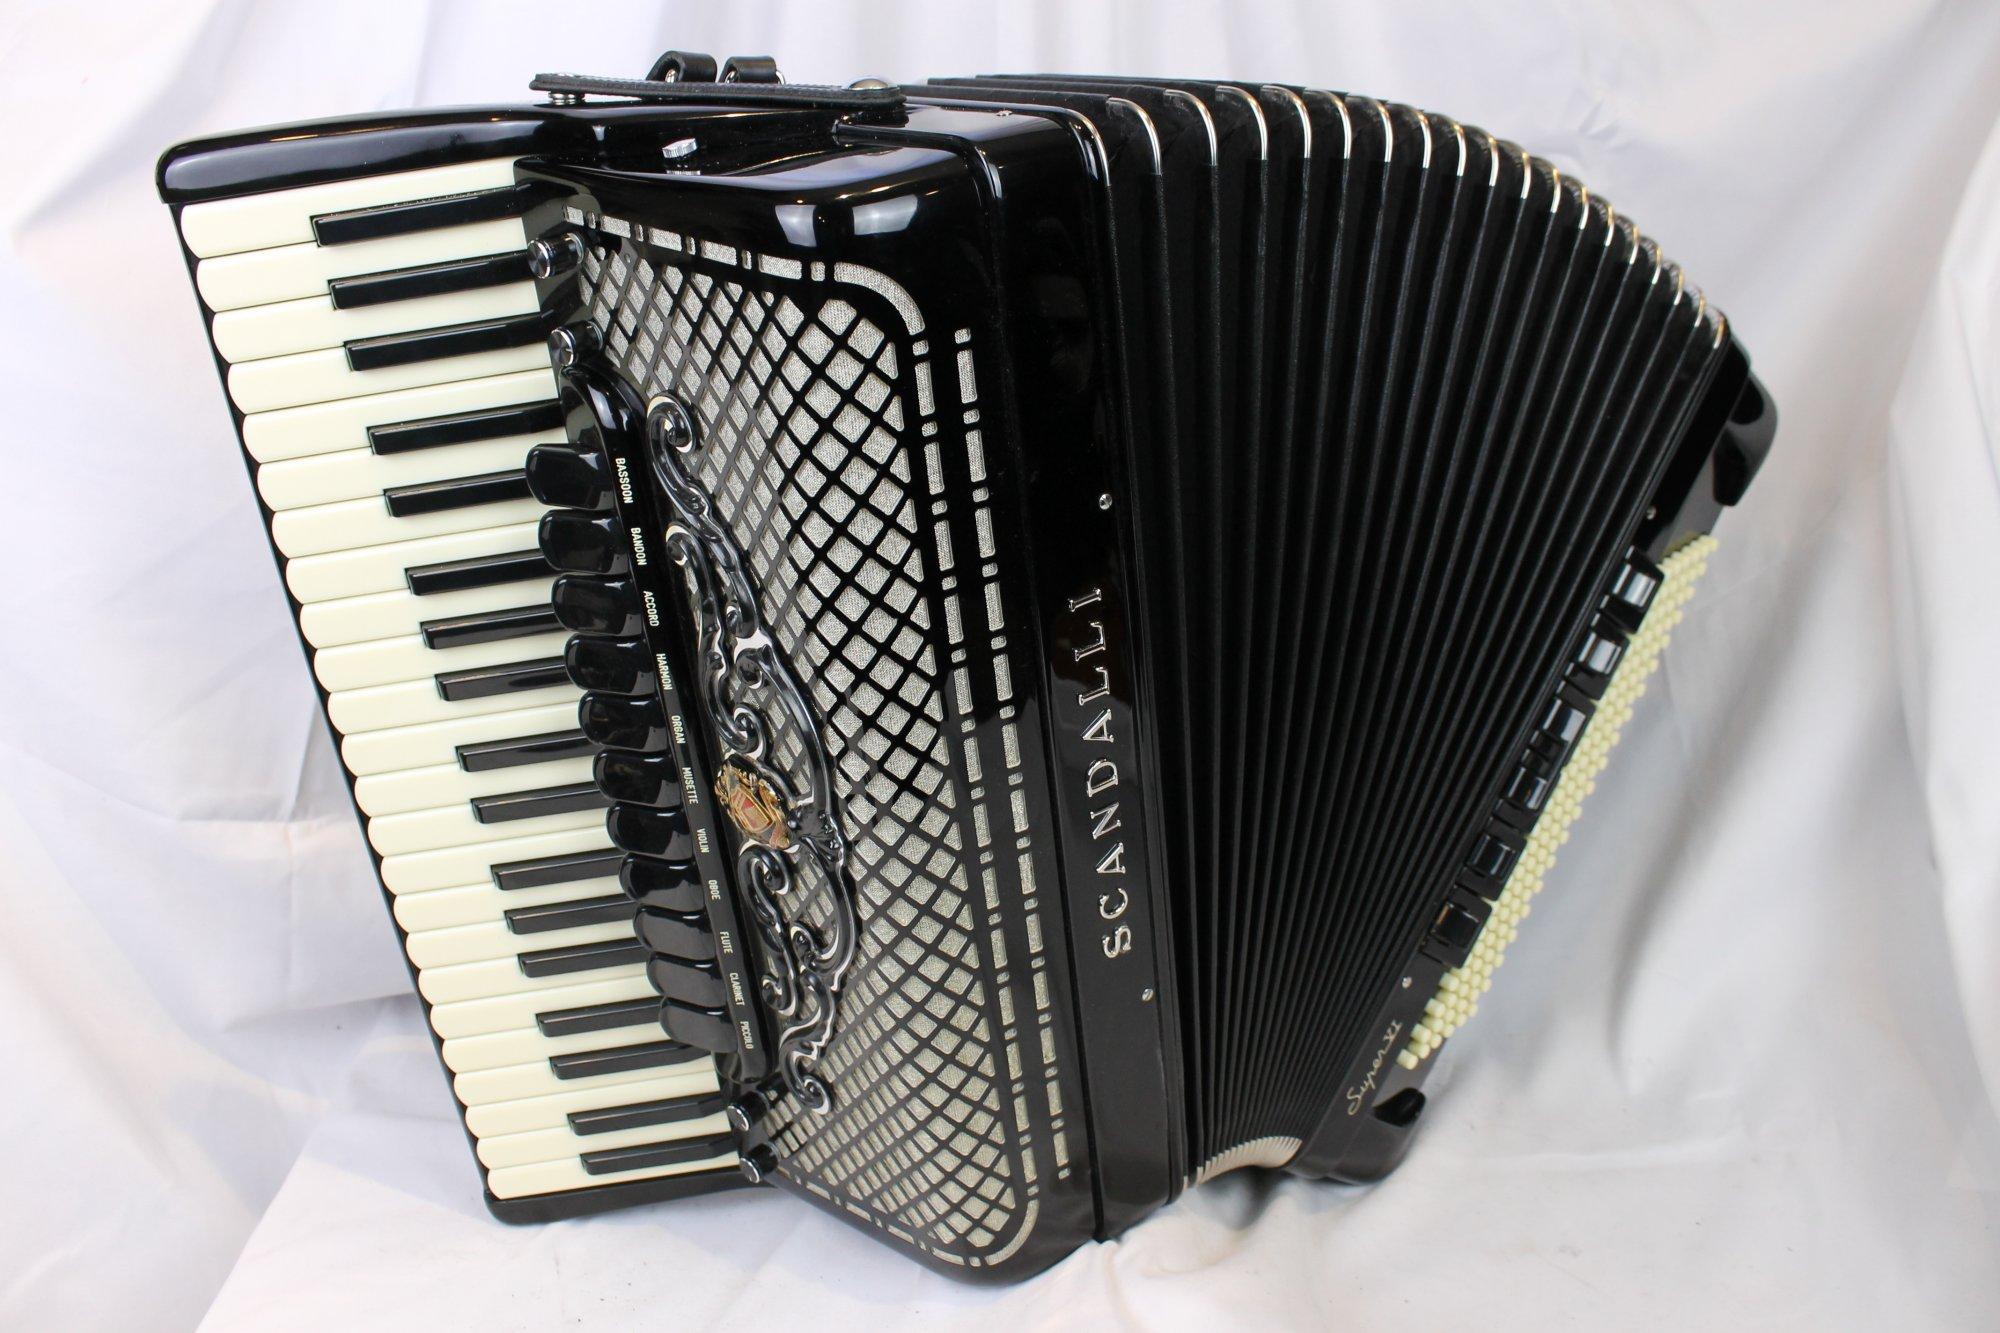 NEW Black Scandalli Super VI Extreme Piano Accordion LMMH 41 120